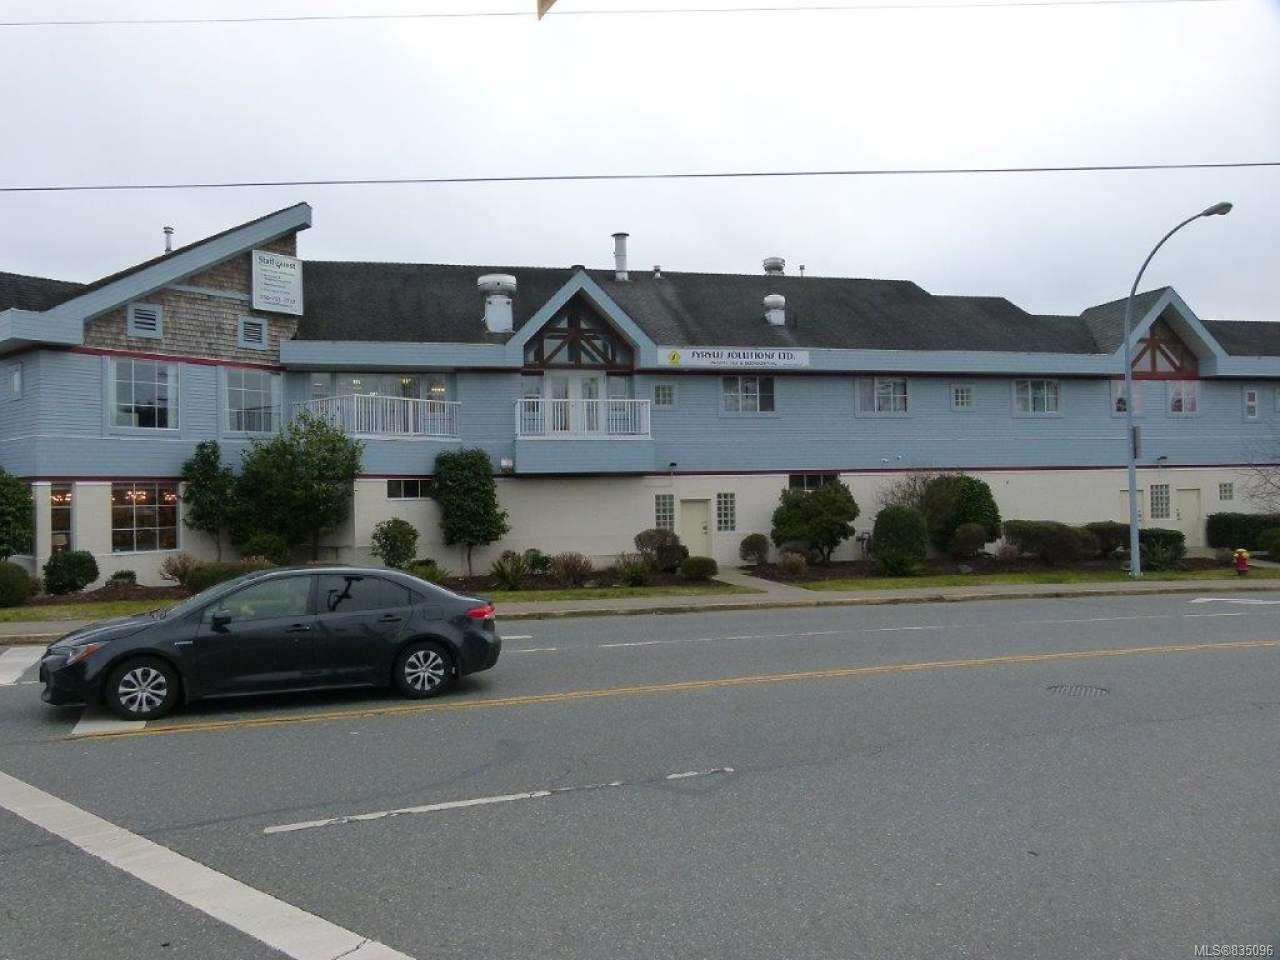 Photo 33: Photos: 2025 Bowen Rd in NANAIMO: Na Central Nanaimo Mixed Use for sale (Nanaimo)  : MLS®# 835096